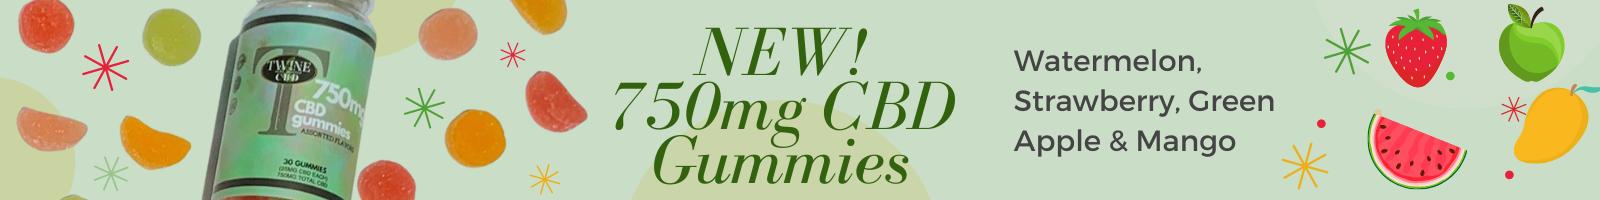 750mg CBD Oils on Sale!